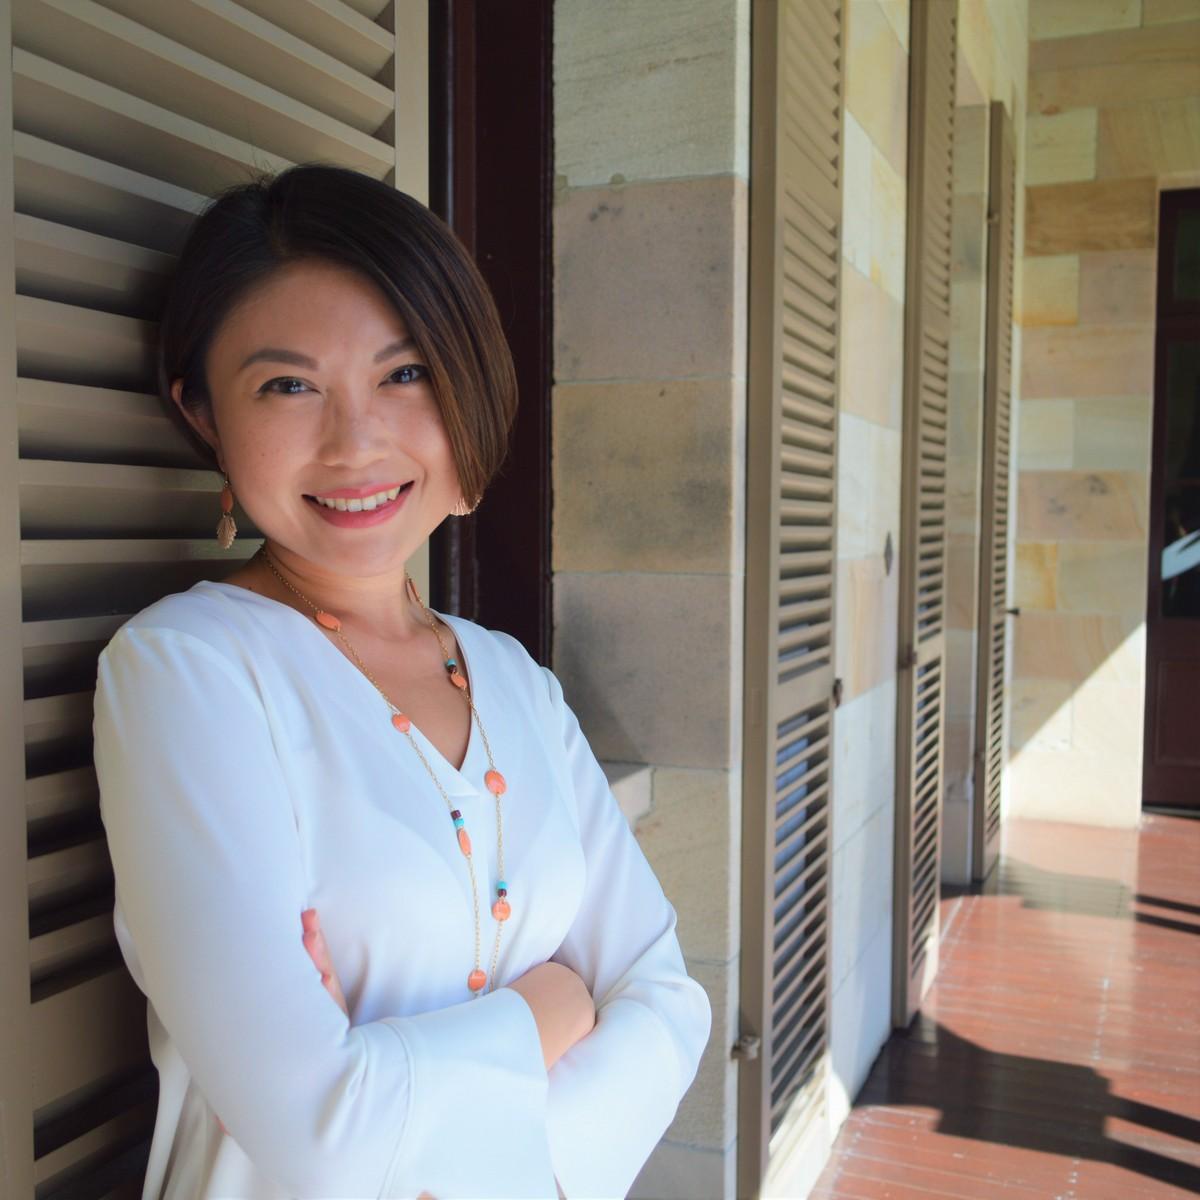 Dr. Elaine Yang